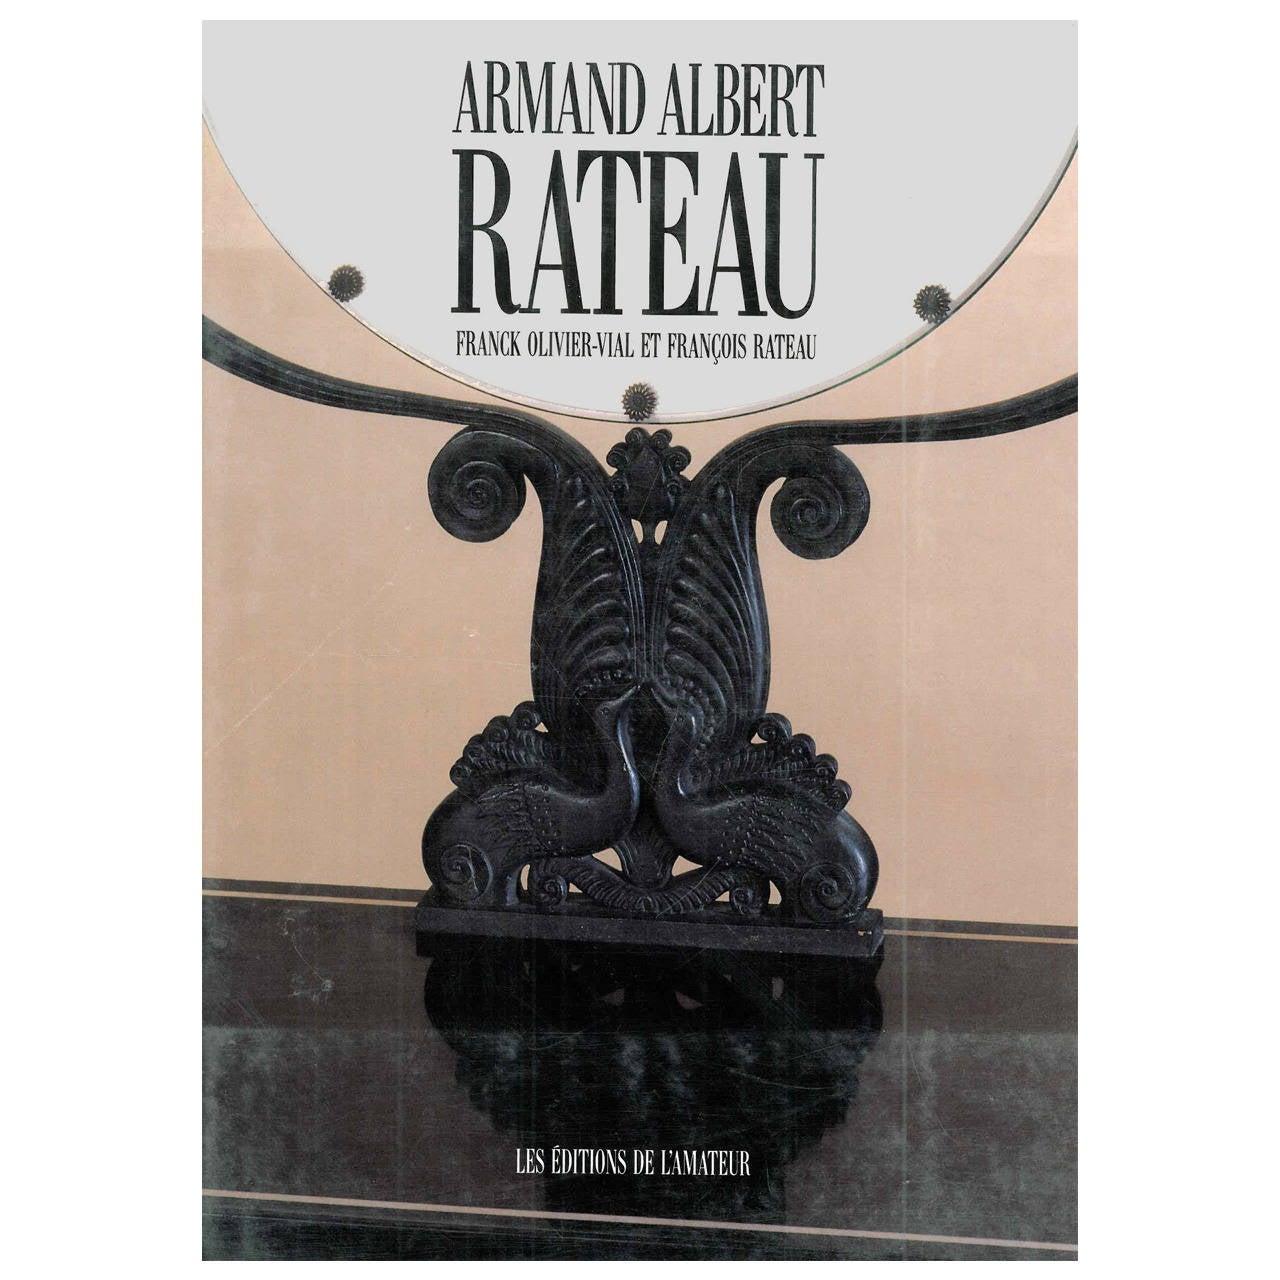 Armand Albert Rateau ( book )